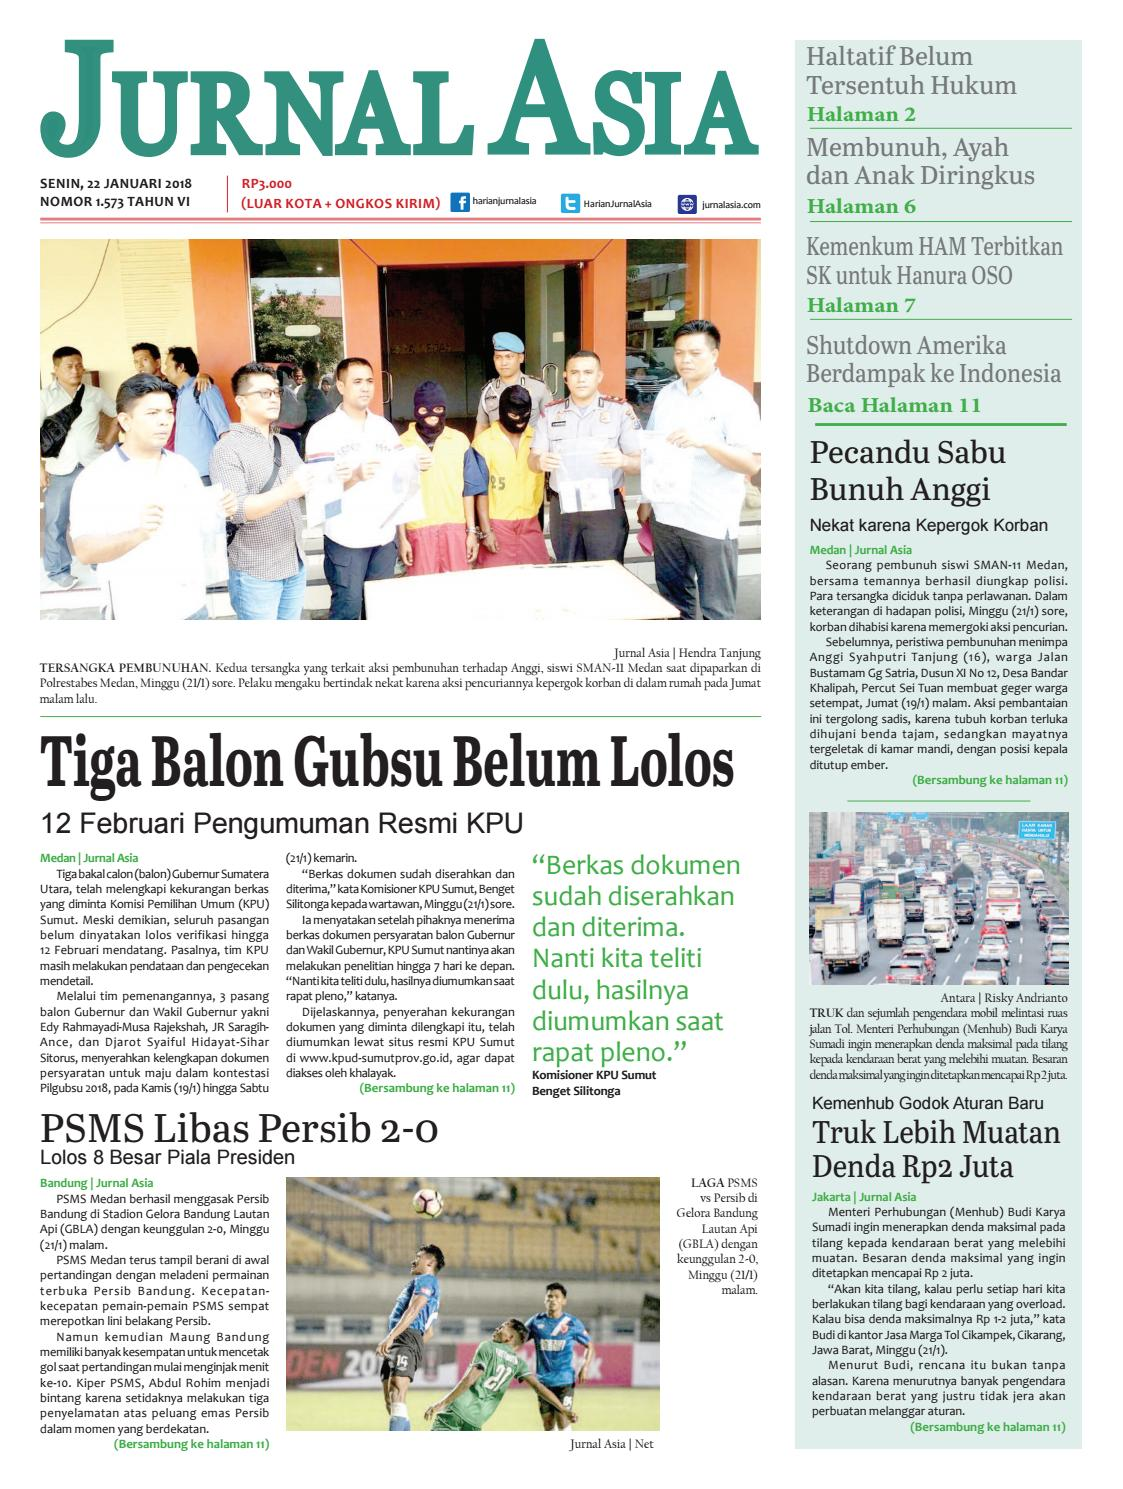 Harian Jurnal Asia Edisi Senin 22 Januari 2018 By Harian Jurnal Asia Medan Issuu